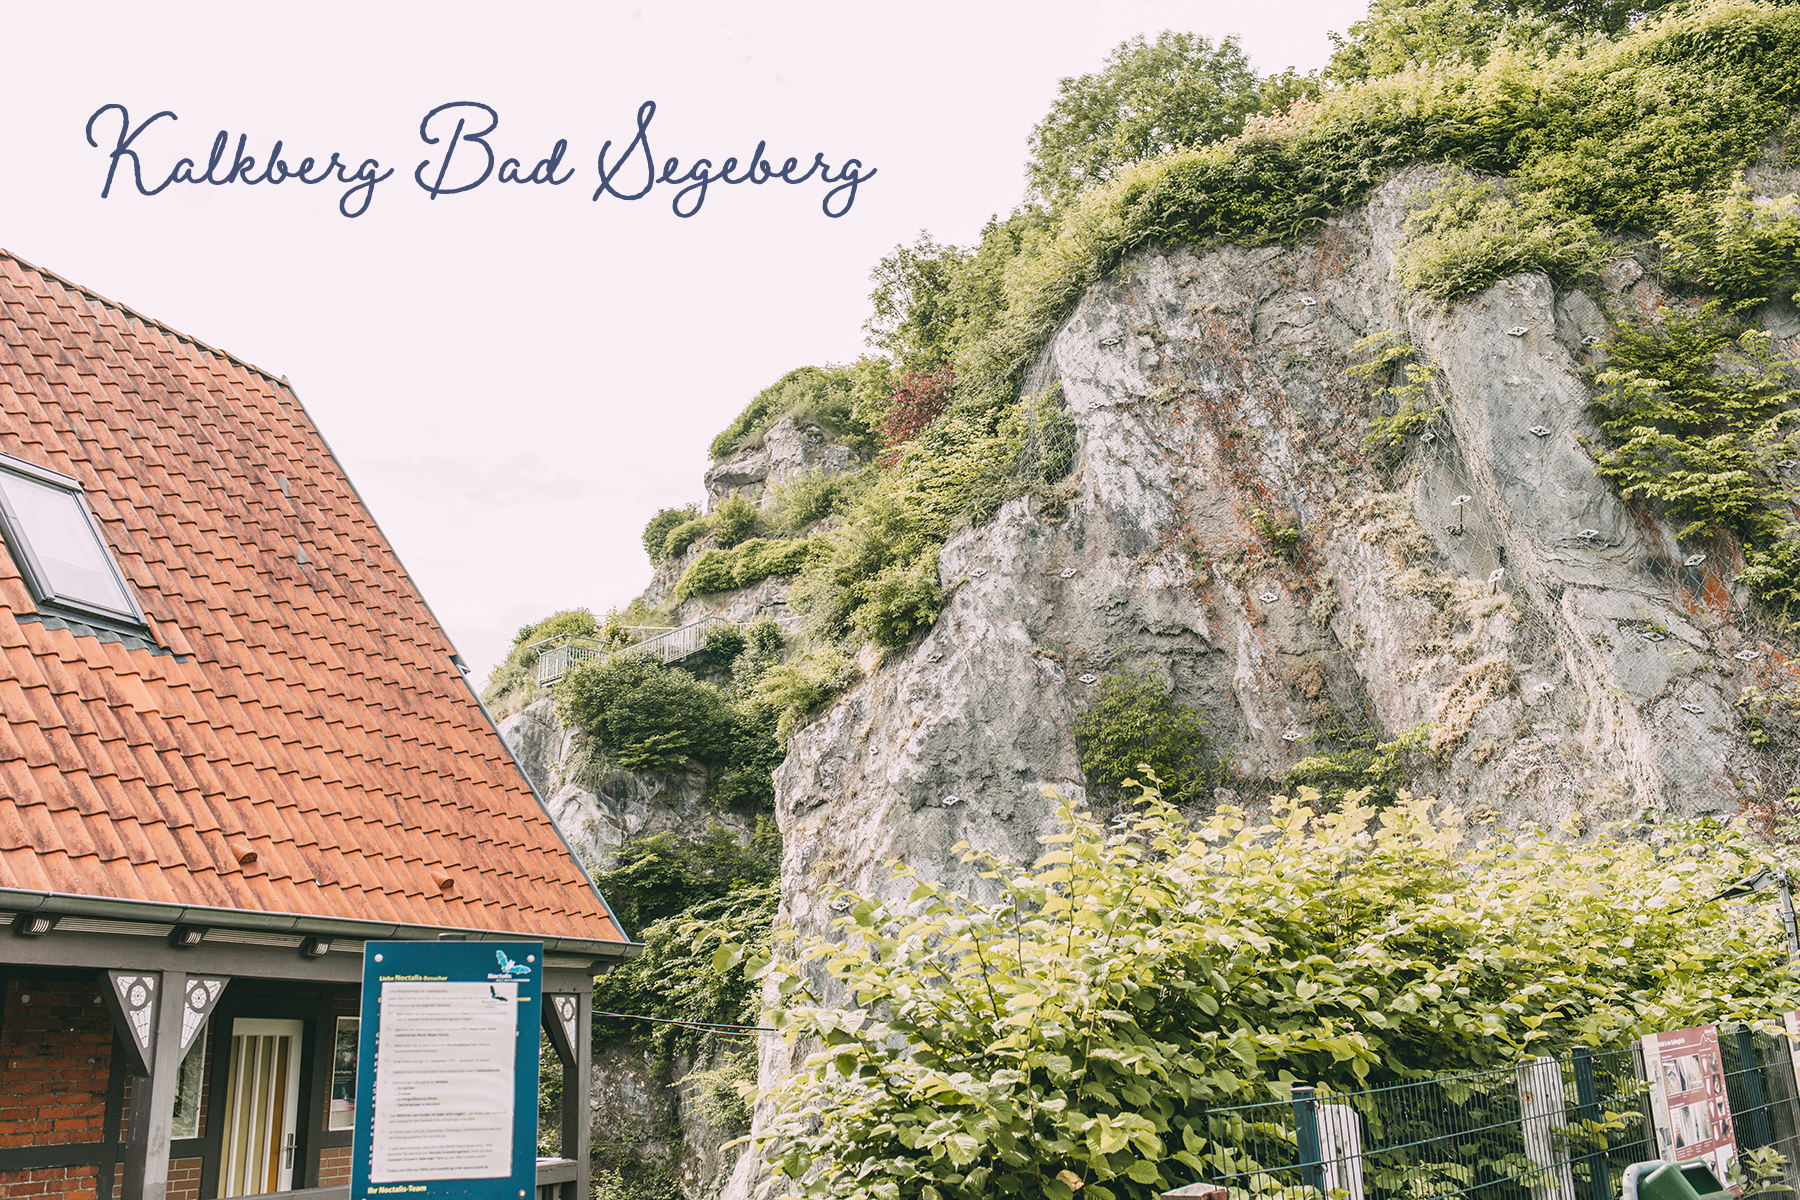 Kalkberg Bad Segeberg